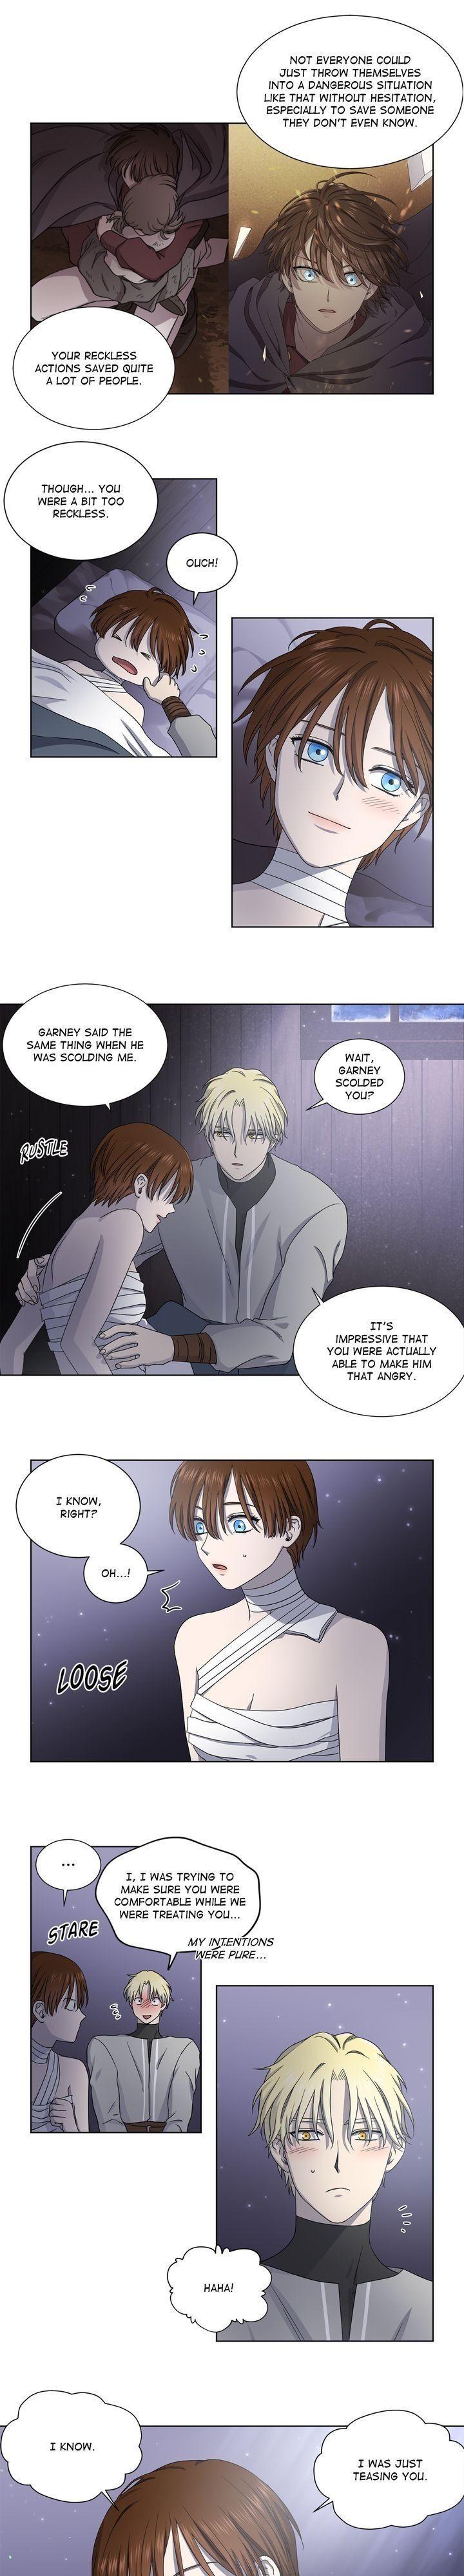 Golden Time Chapter 55 page 5 - Mangakakalots.com